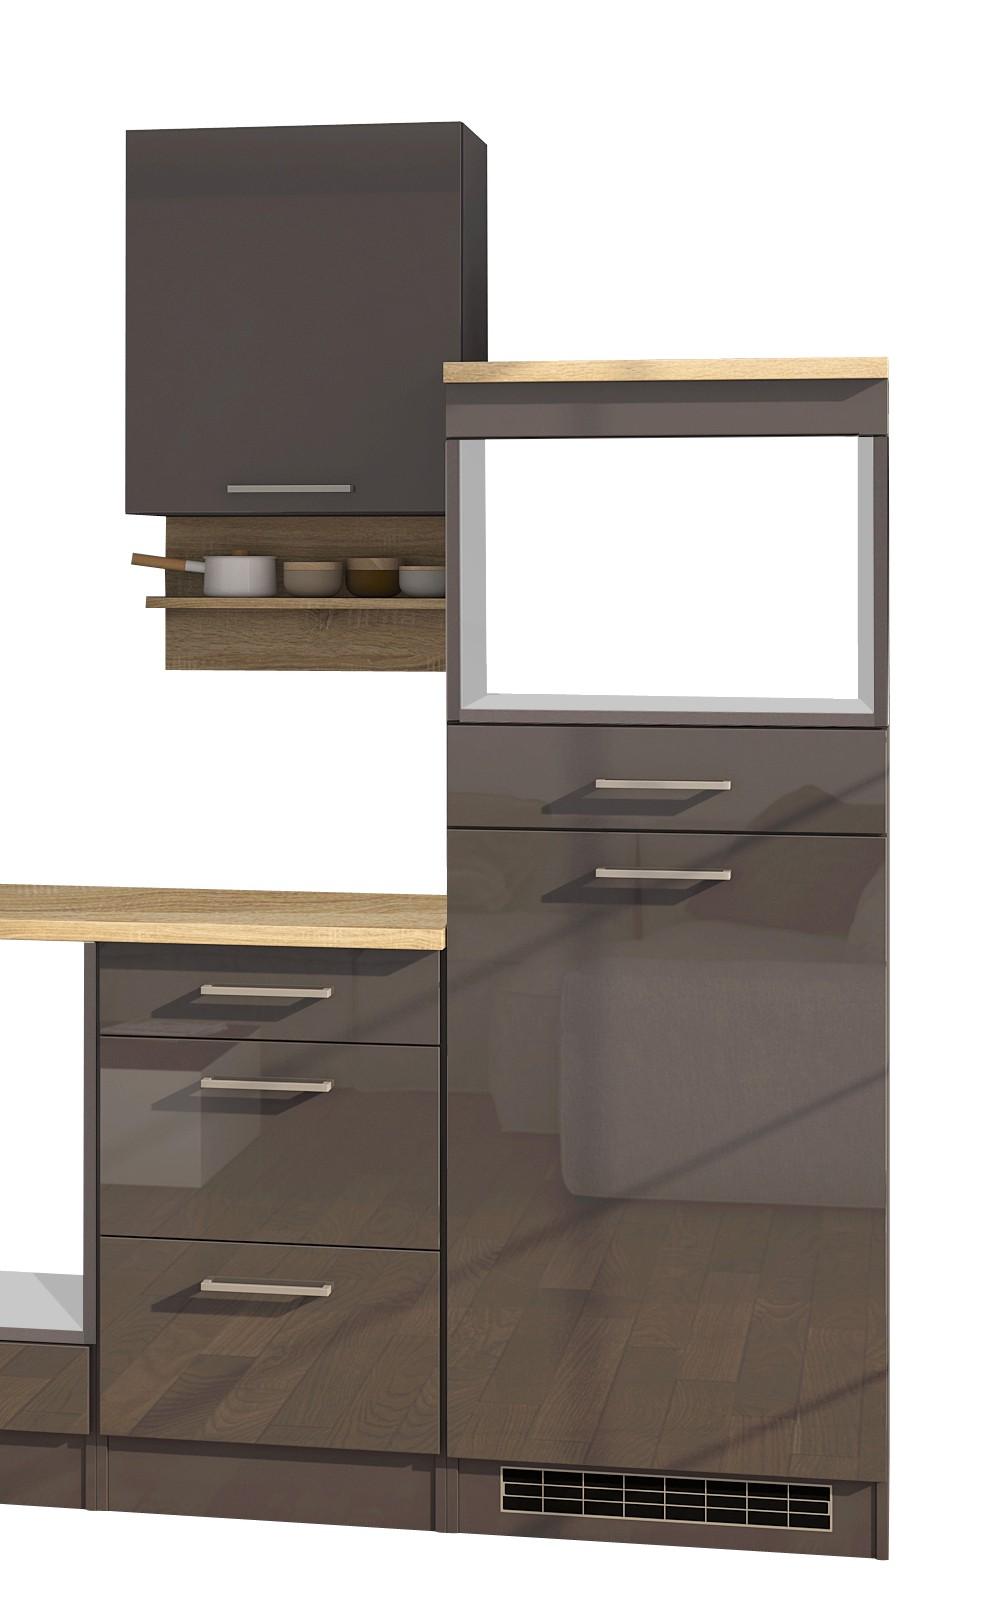 einbauk che ohne elektroger te k chenblock ohne ger te k chenzeile 270 cm grau ebay. Black Bedroom Furniture Sets. Home Design Ideas